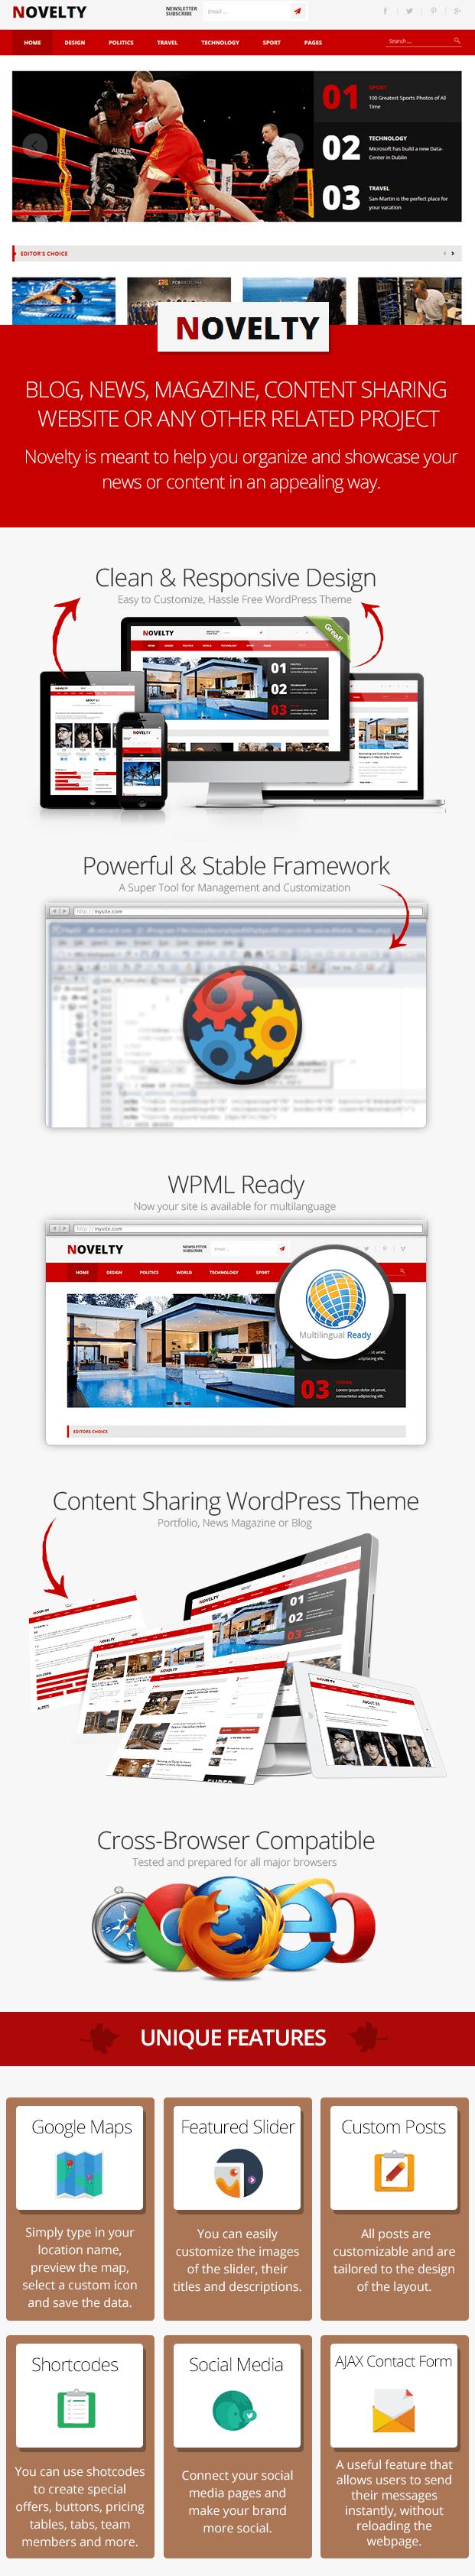 magazine-wordpress-premium-theme